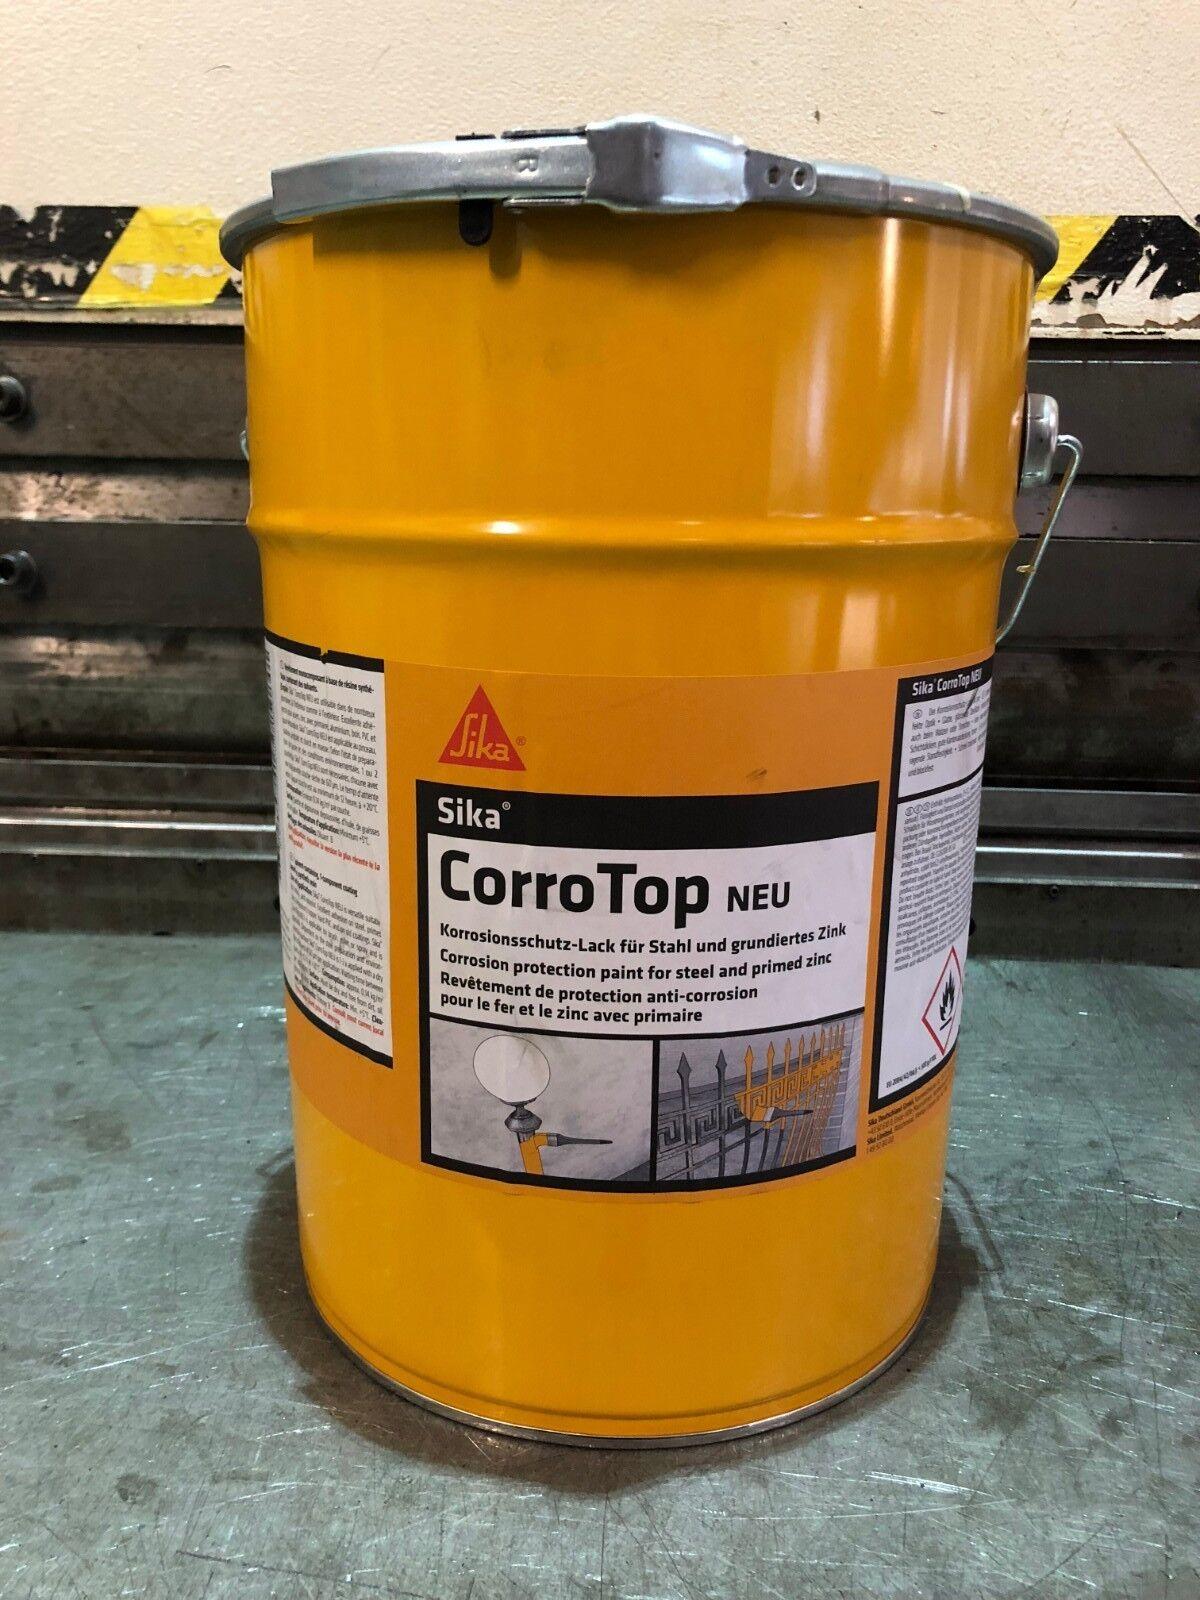 Sika Corro Top Farbe Tannengrün 6009 12,5kg Stahlgrund